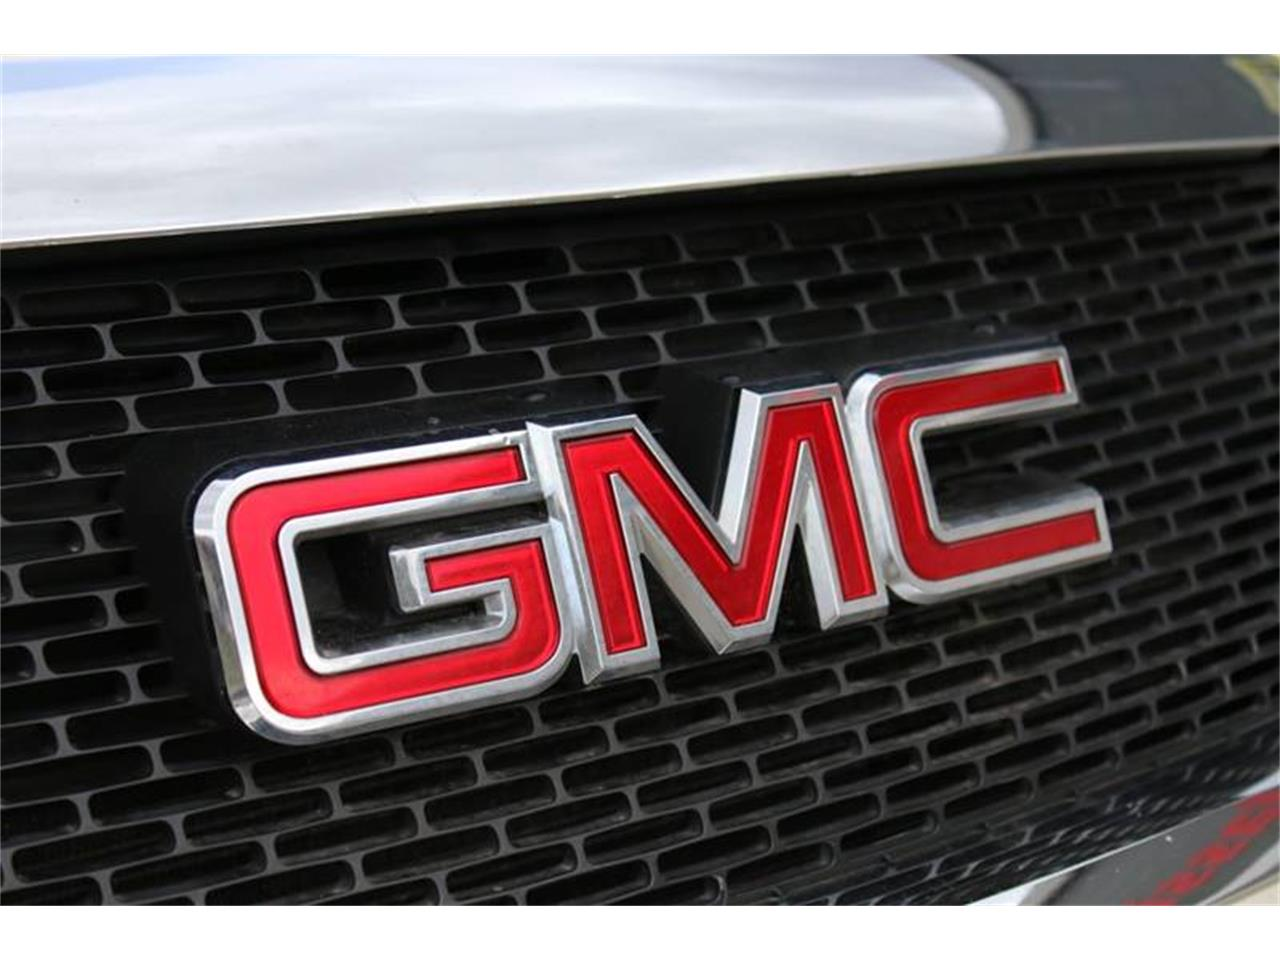 2011 GMC Acadia (CC-1328282) for sale in Hilton, New York